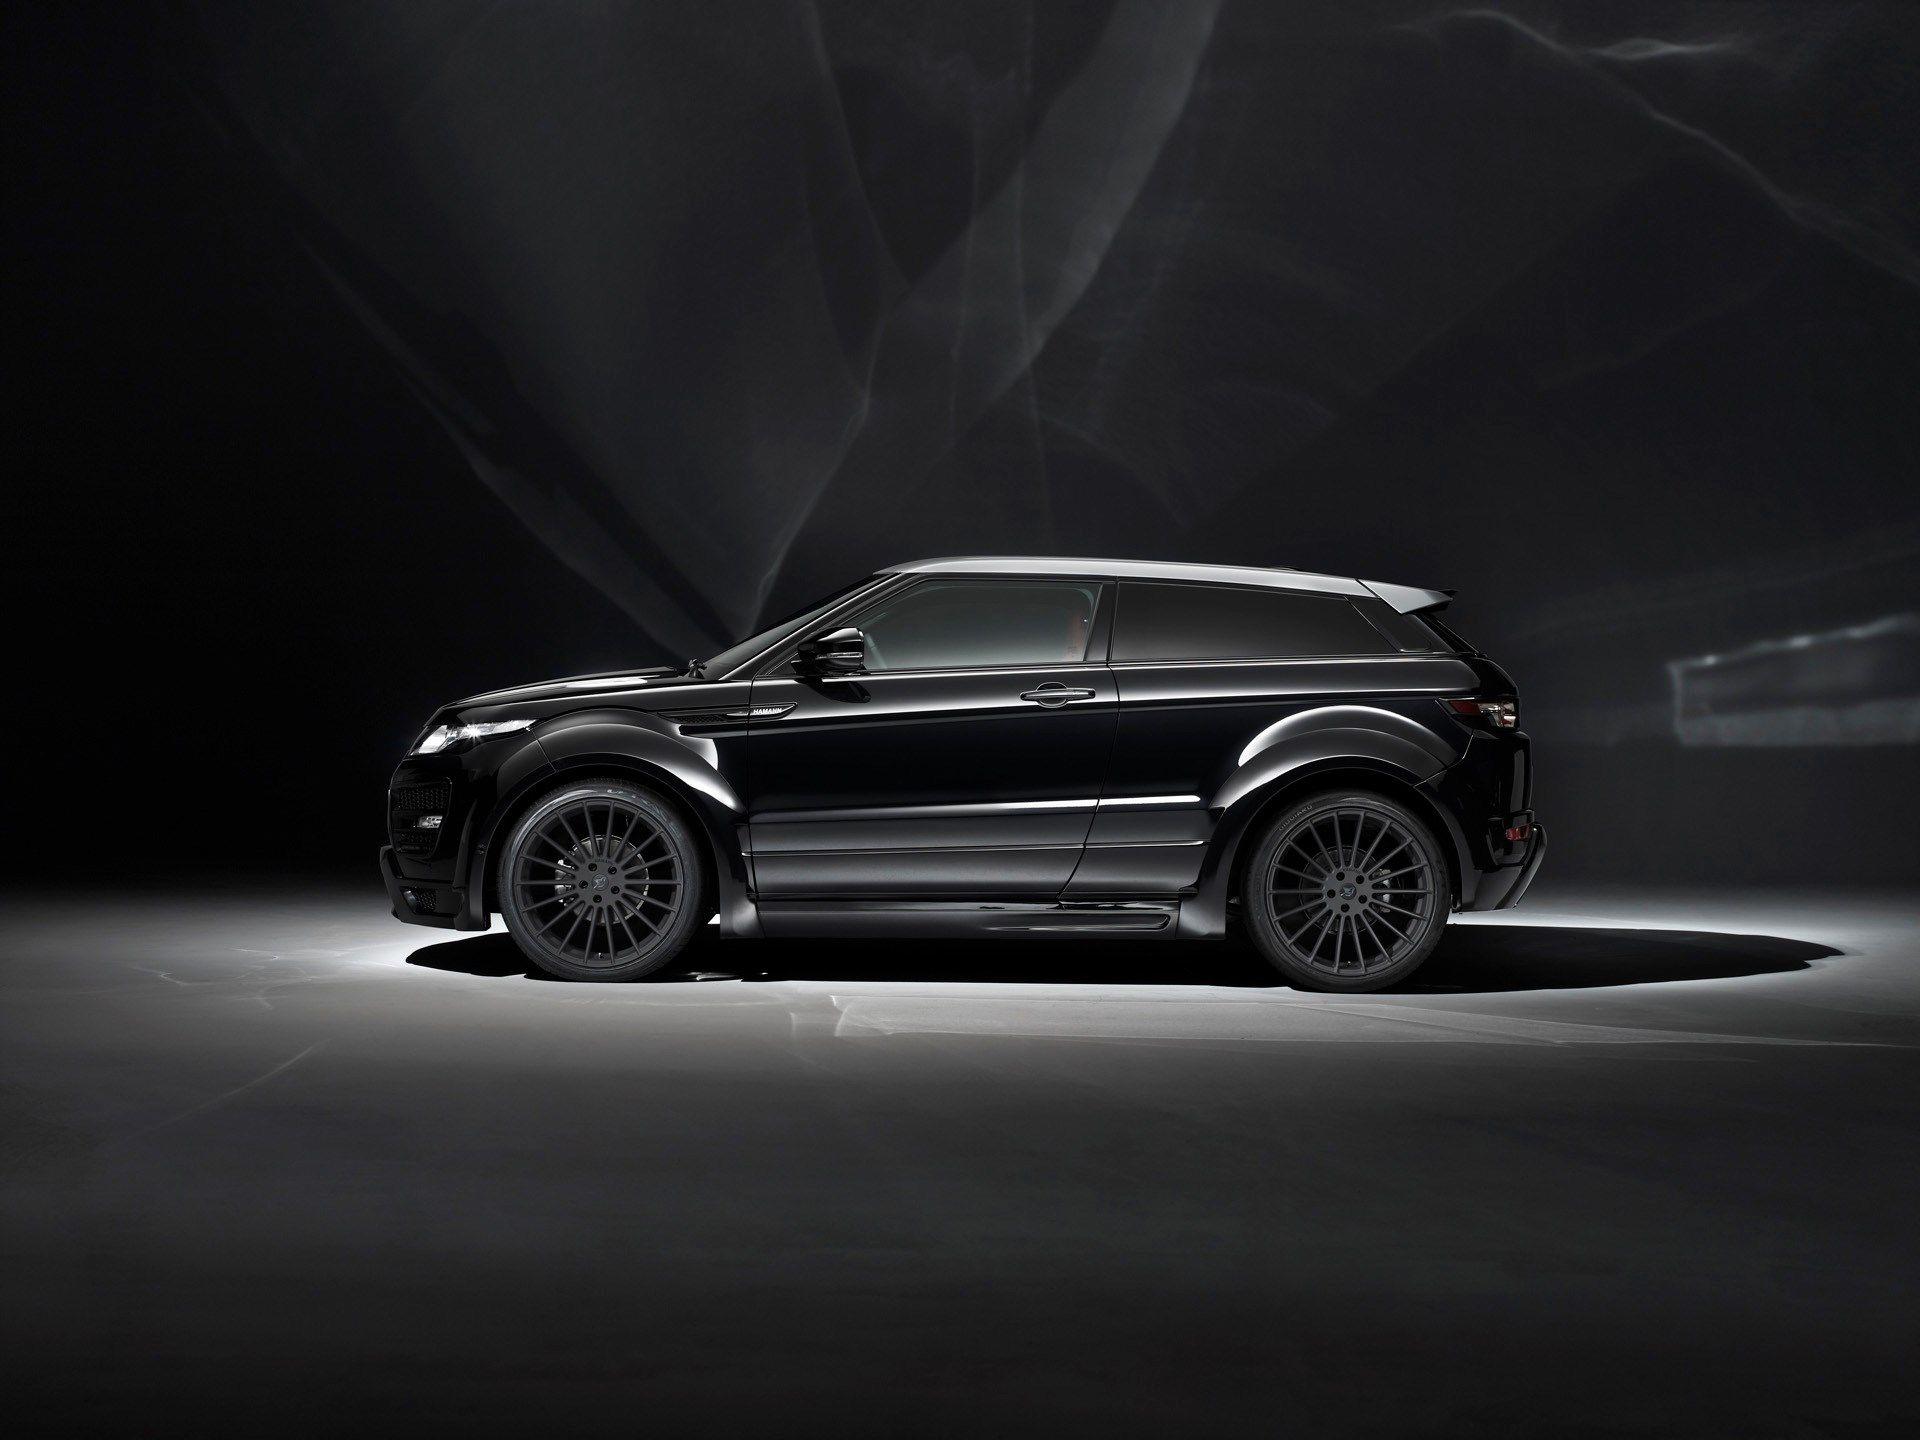 2011 land rover dc100 concept side 2 1280x960 wallpaper - 2012 Hamann Range Rover Evoque Suv Tuning D Wallpaper Background